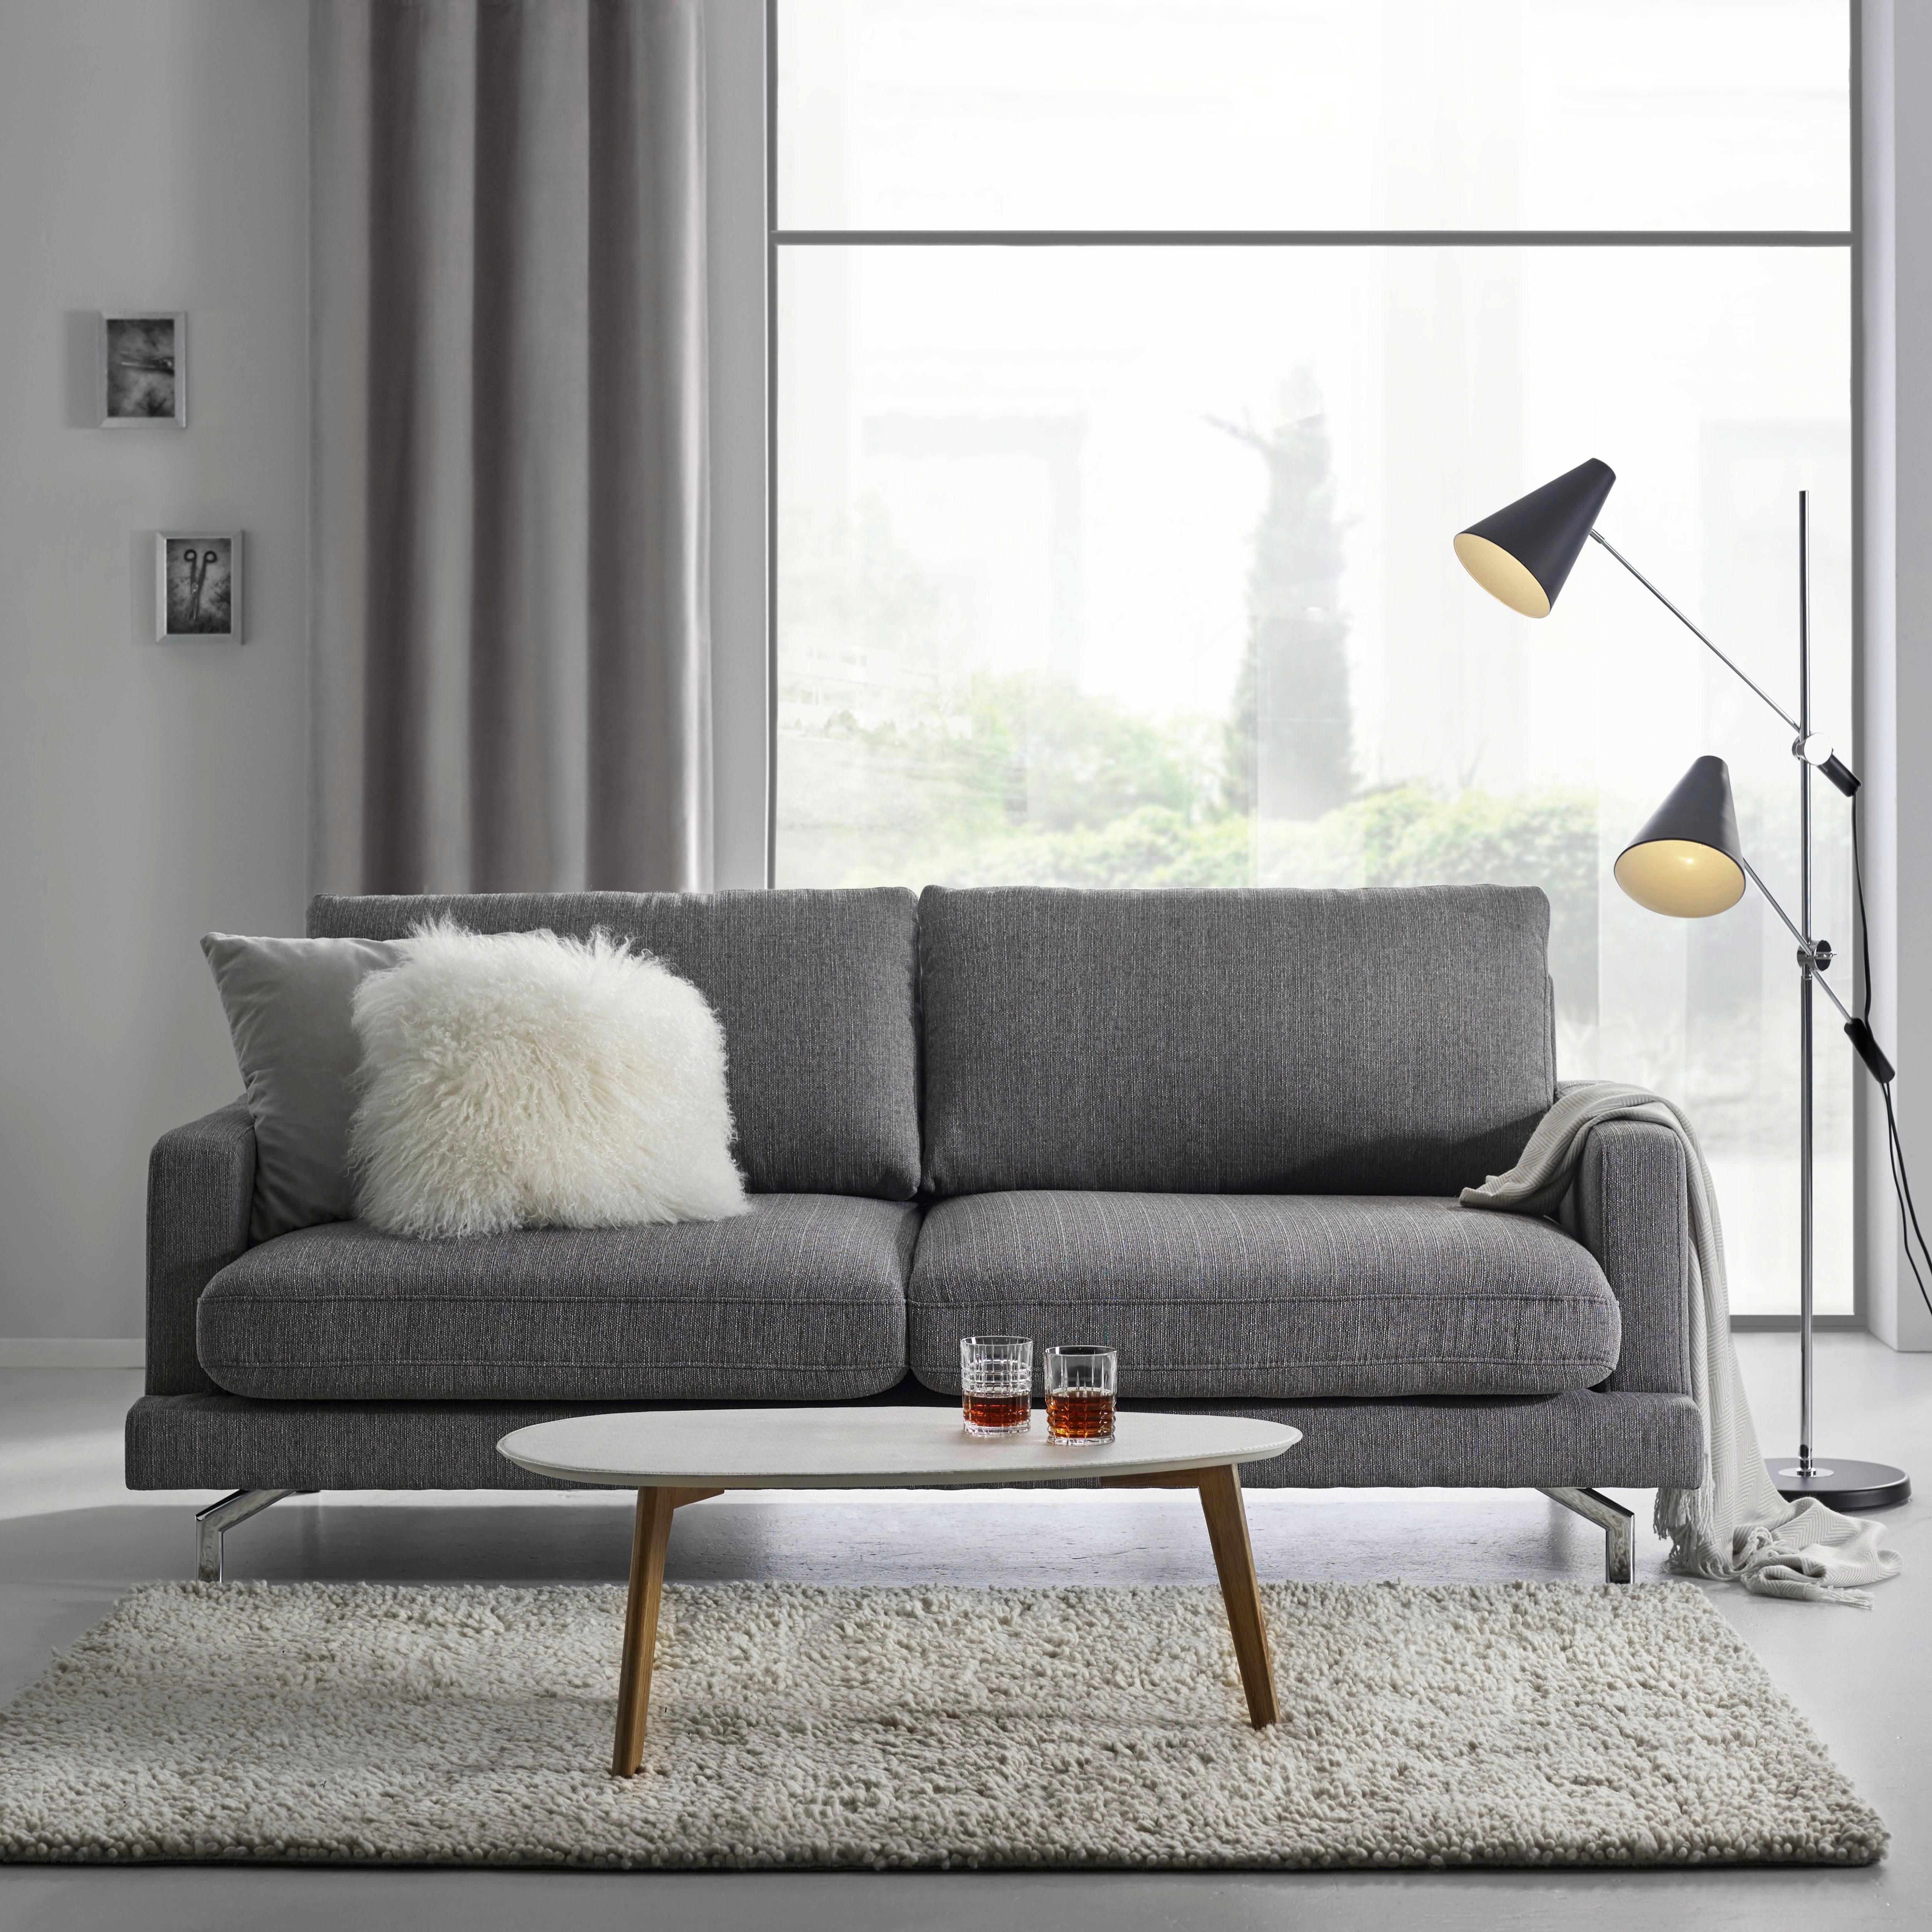 Dreisitzer Sofa Boss - Chromfarben/Grau, KONVENTIONELL, Textil/Metall (205/88/99cm) - LANDSCAPE